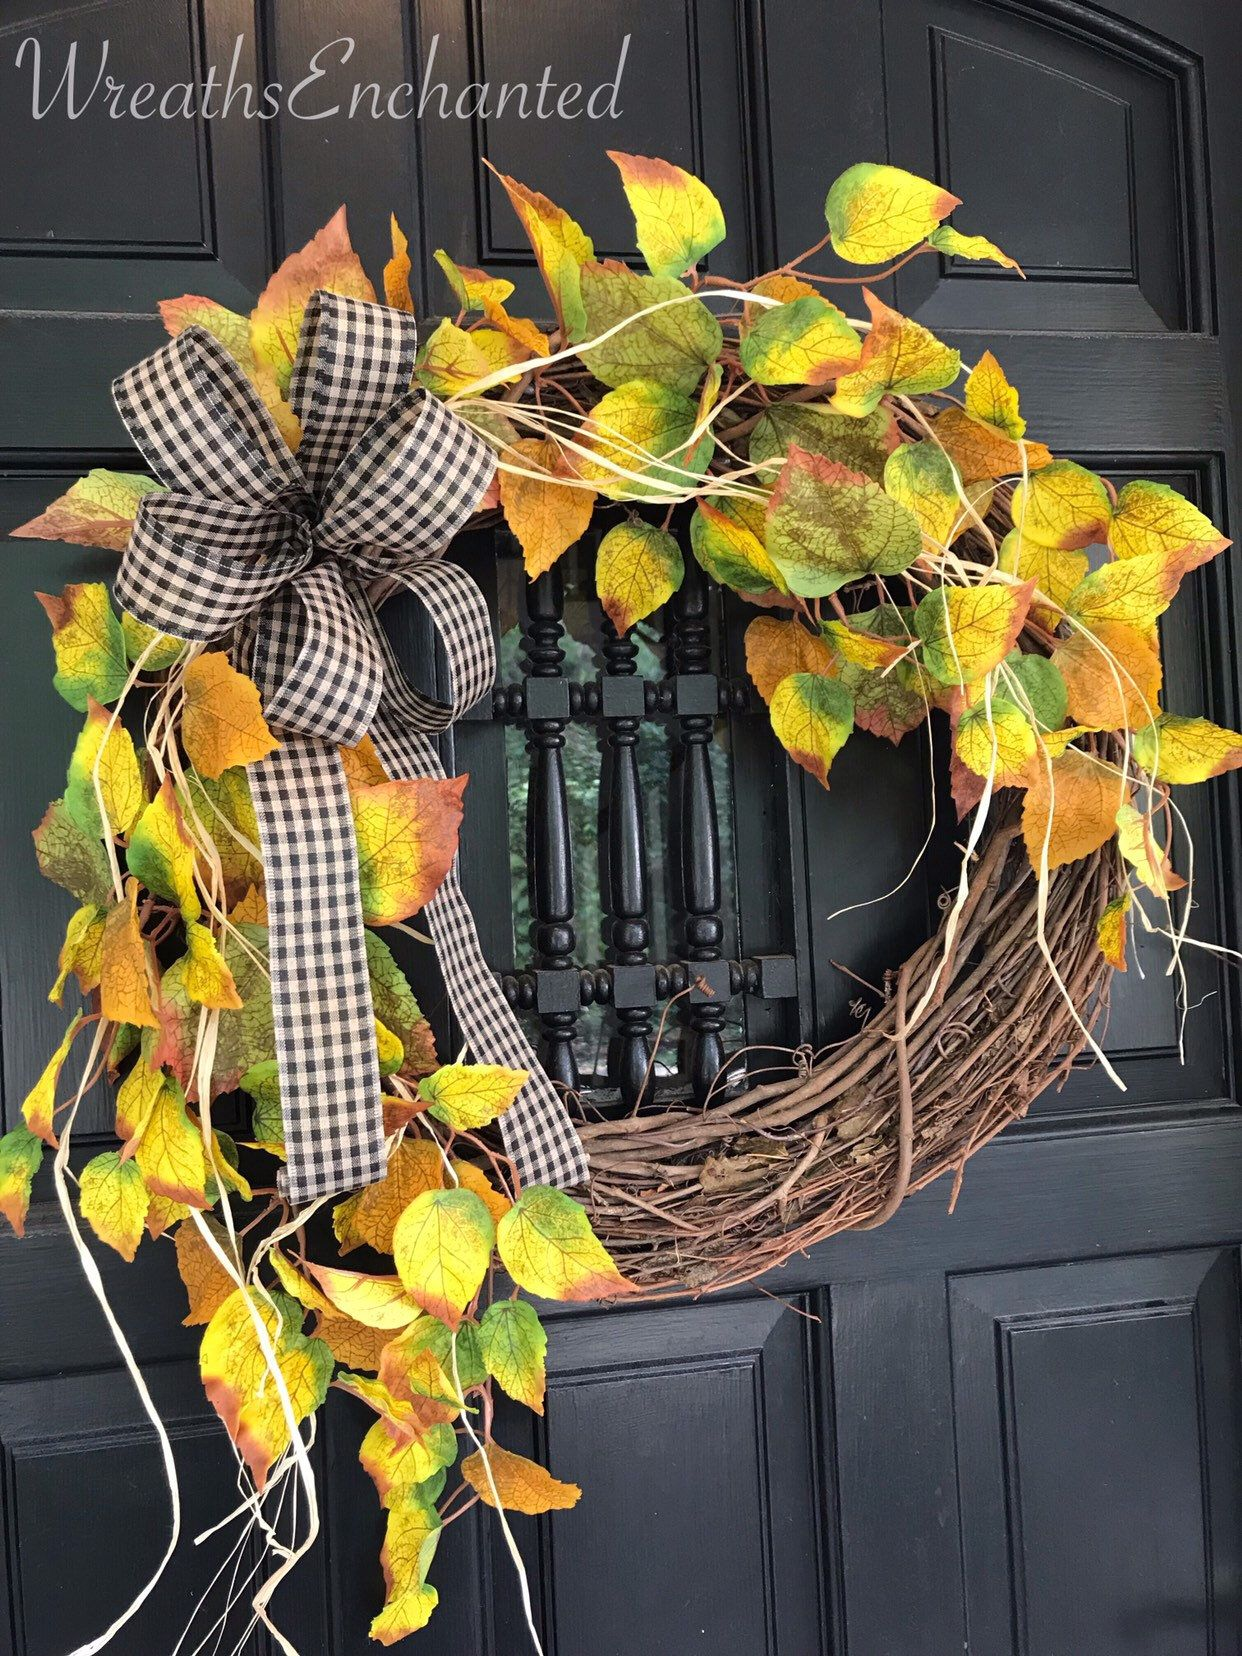 Photo of Autumn wreath Front door wreath Rustic wreath Free shipping Autumn decor Grapevine wreath Autumn leaf wreath Yellow gold wreath Housewarming party